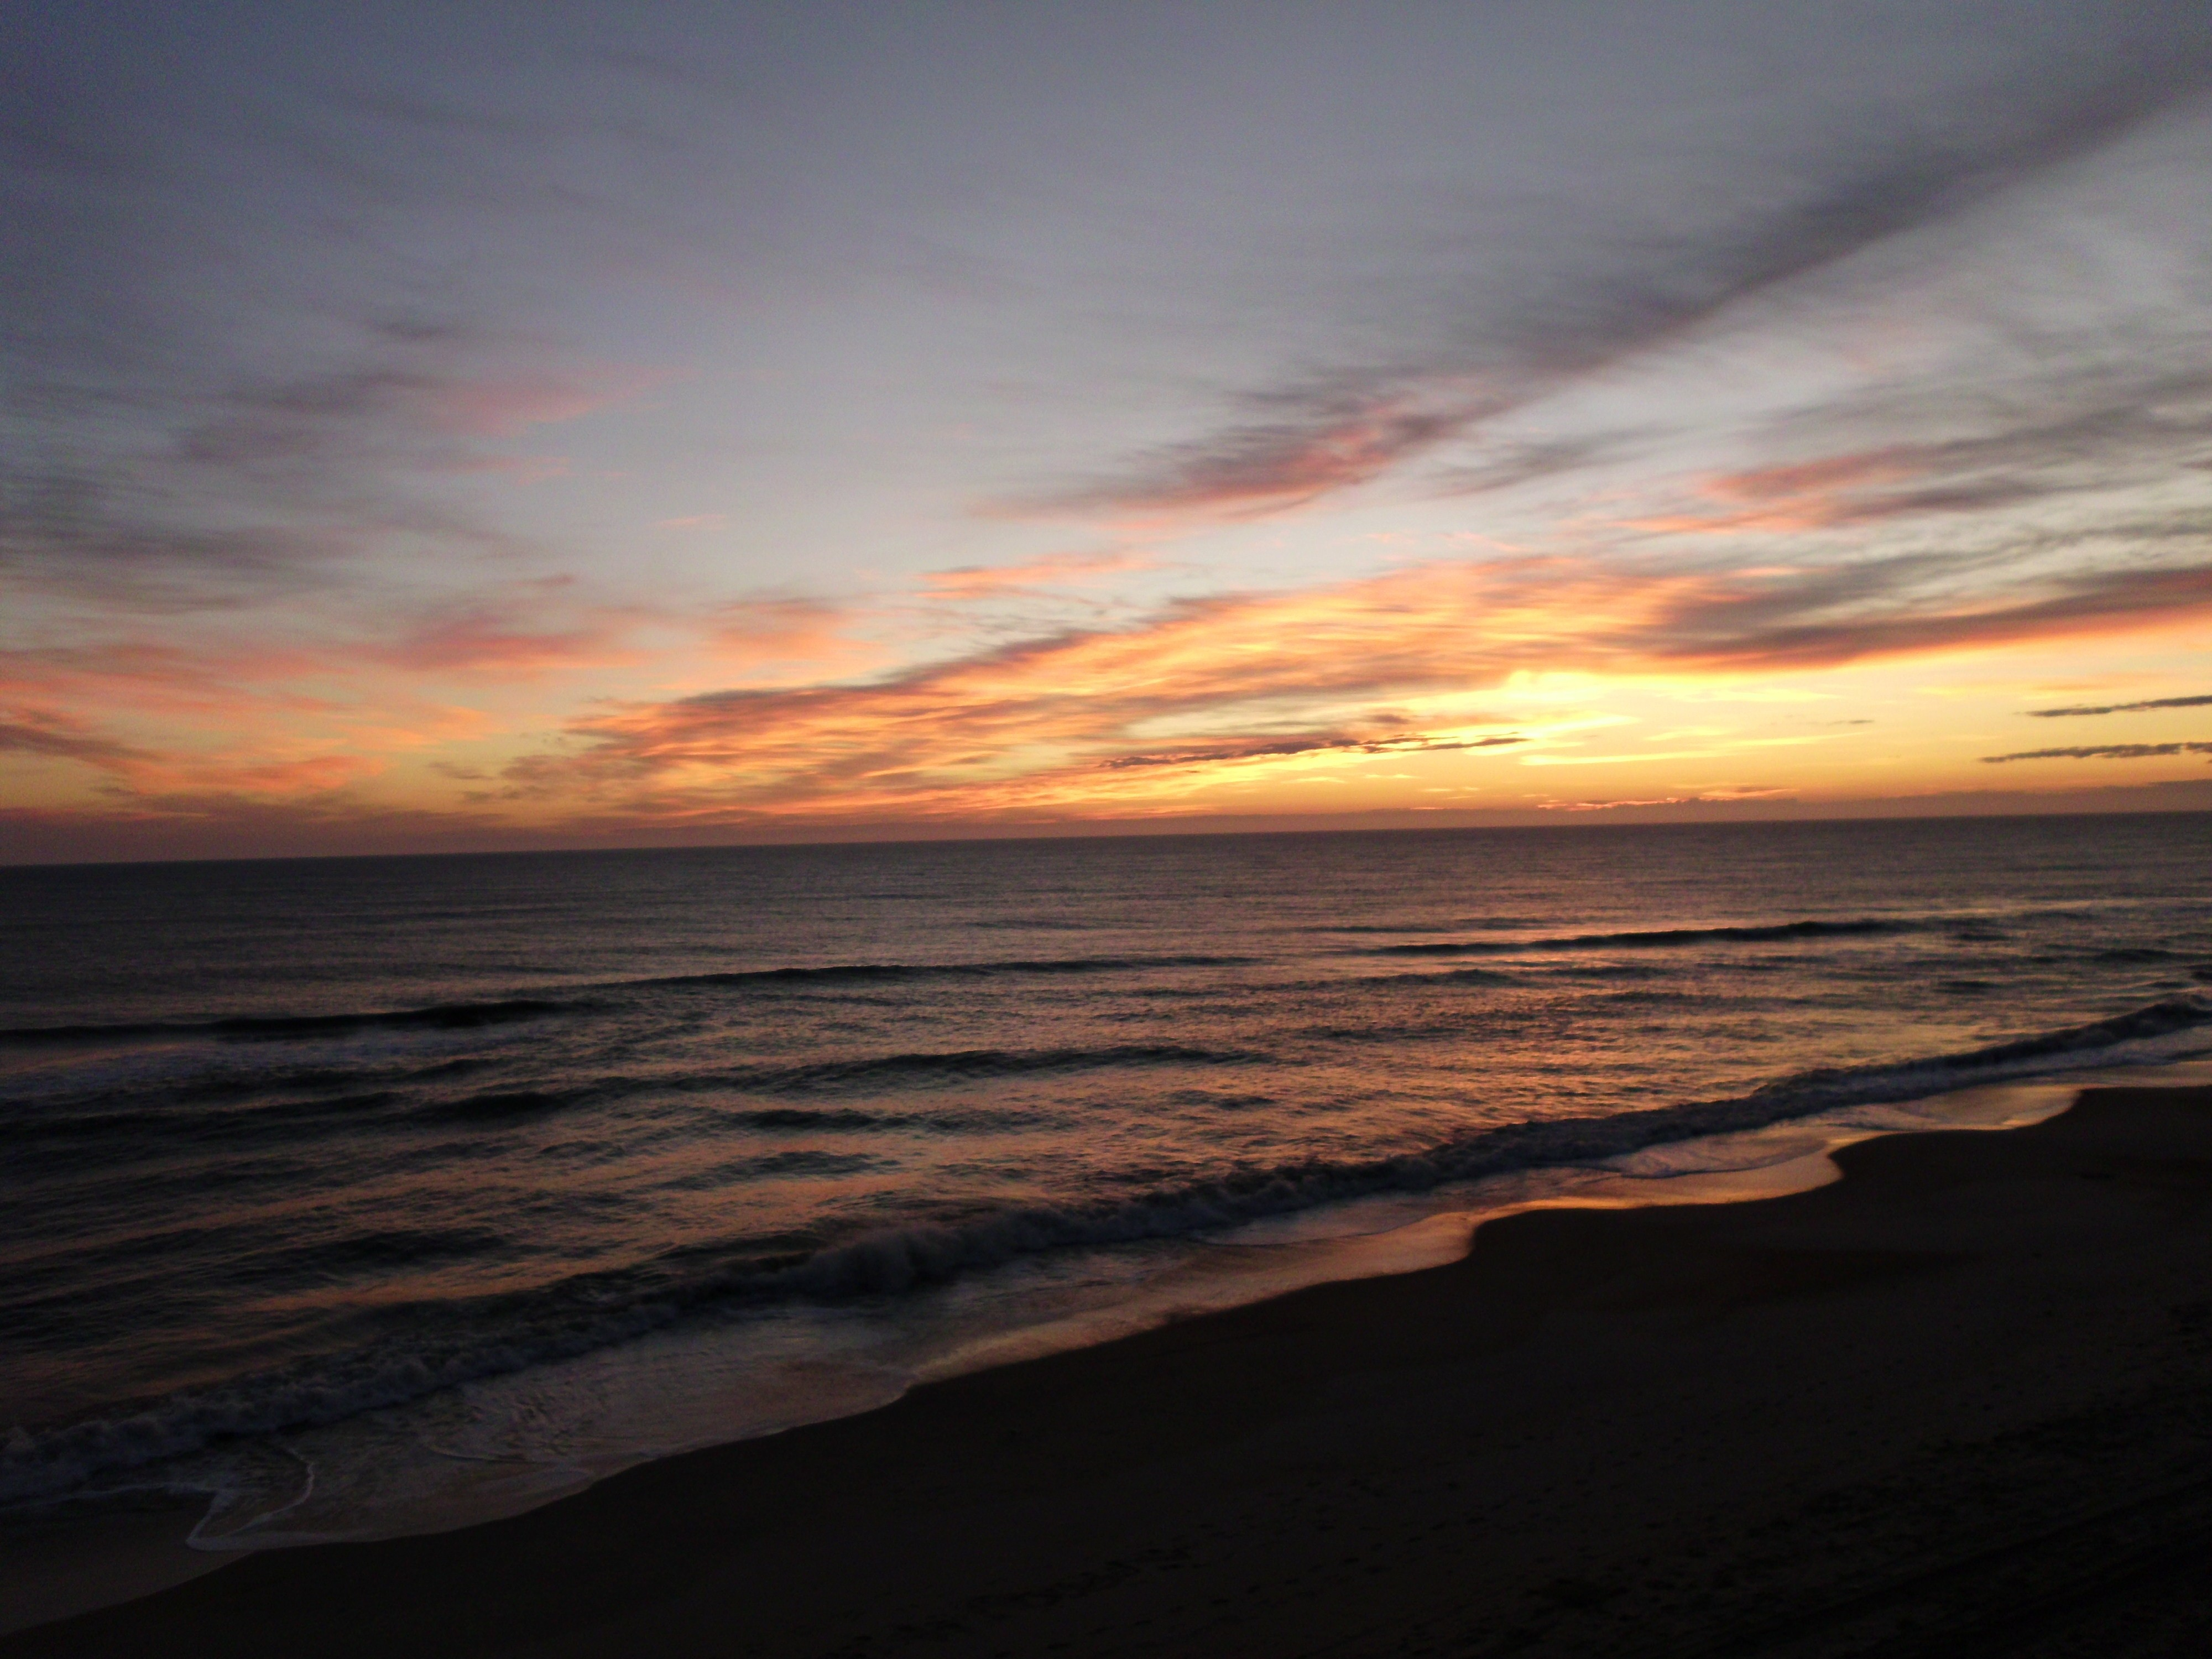 Beaches Beautiful Sunrise Nags Head Sunshine Ocean North Carolina 4000x3000